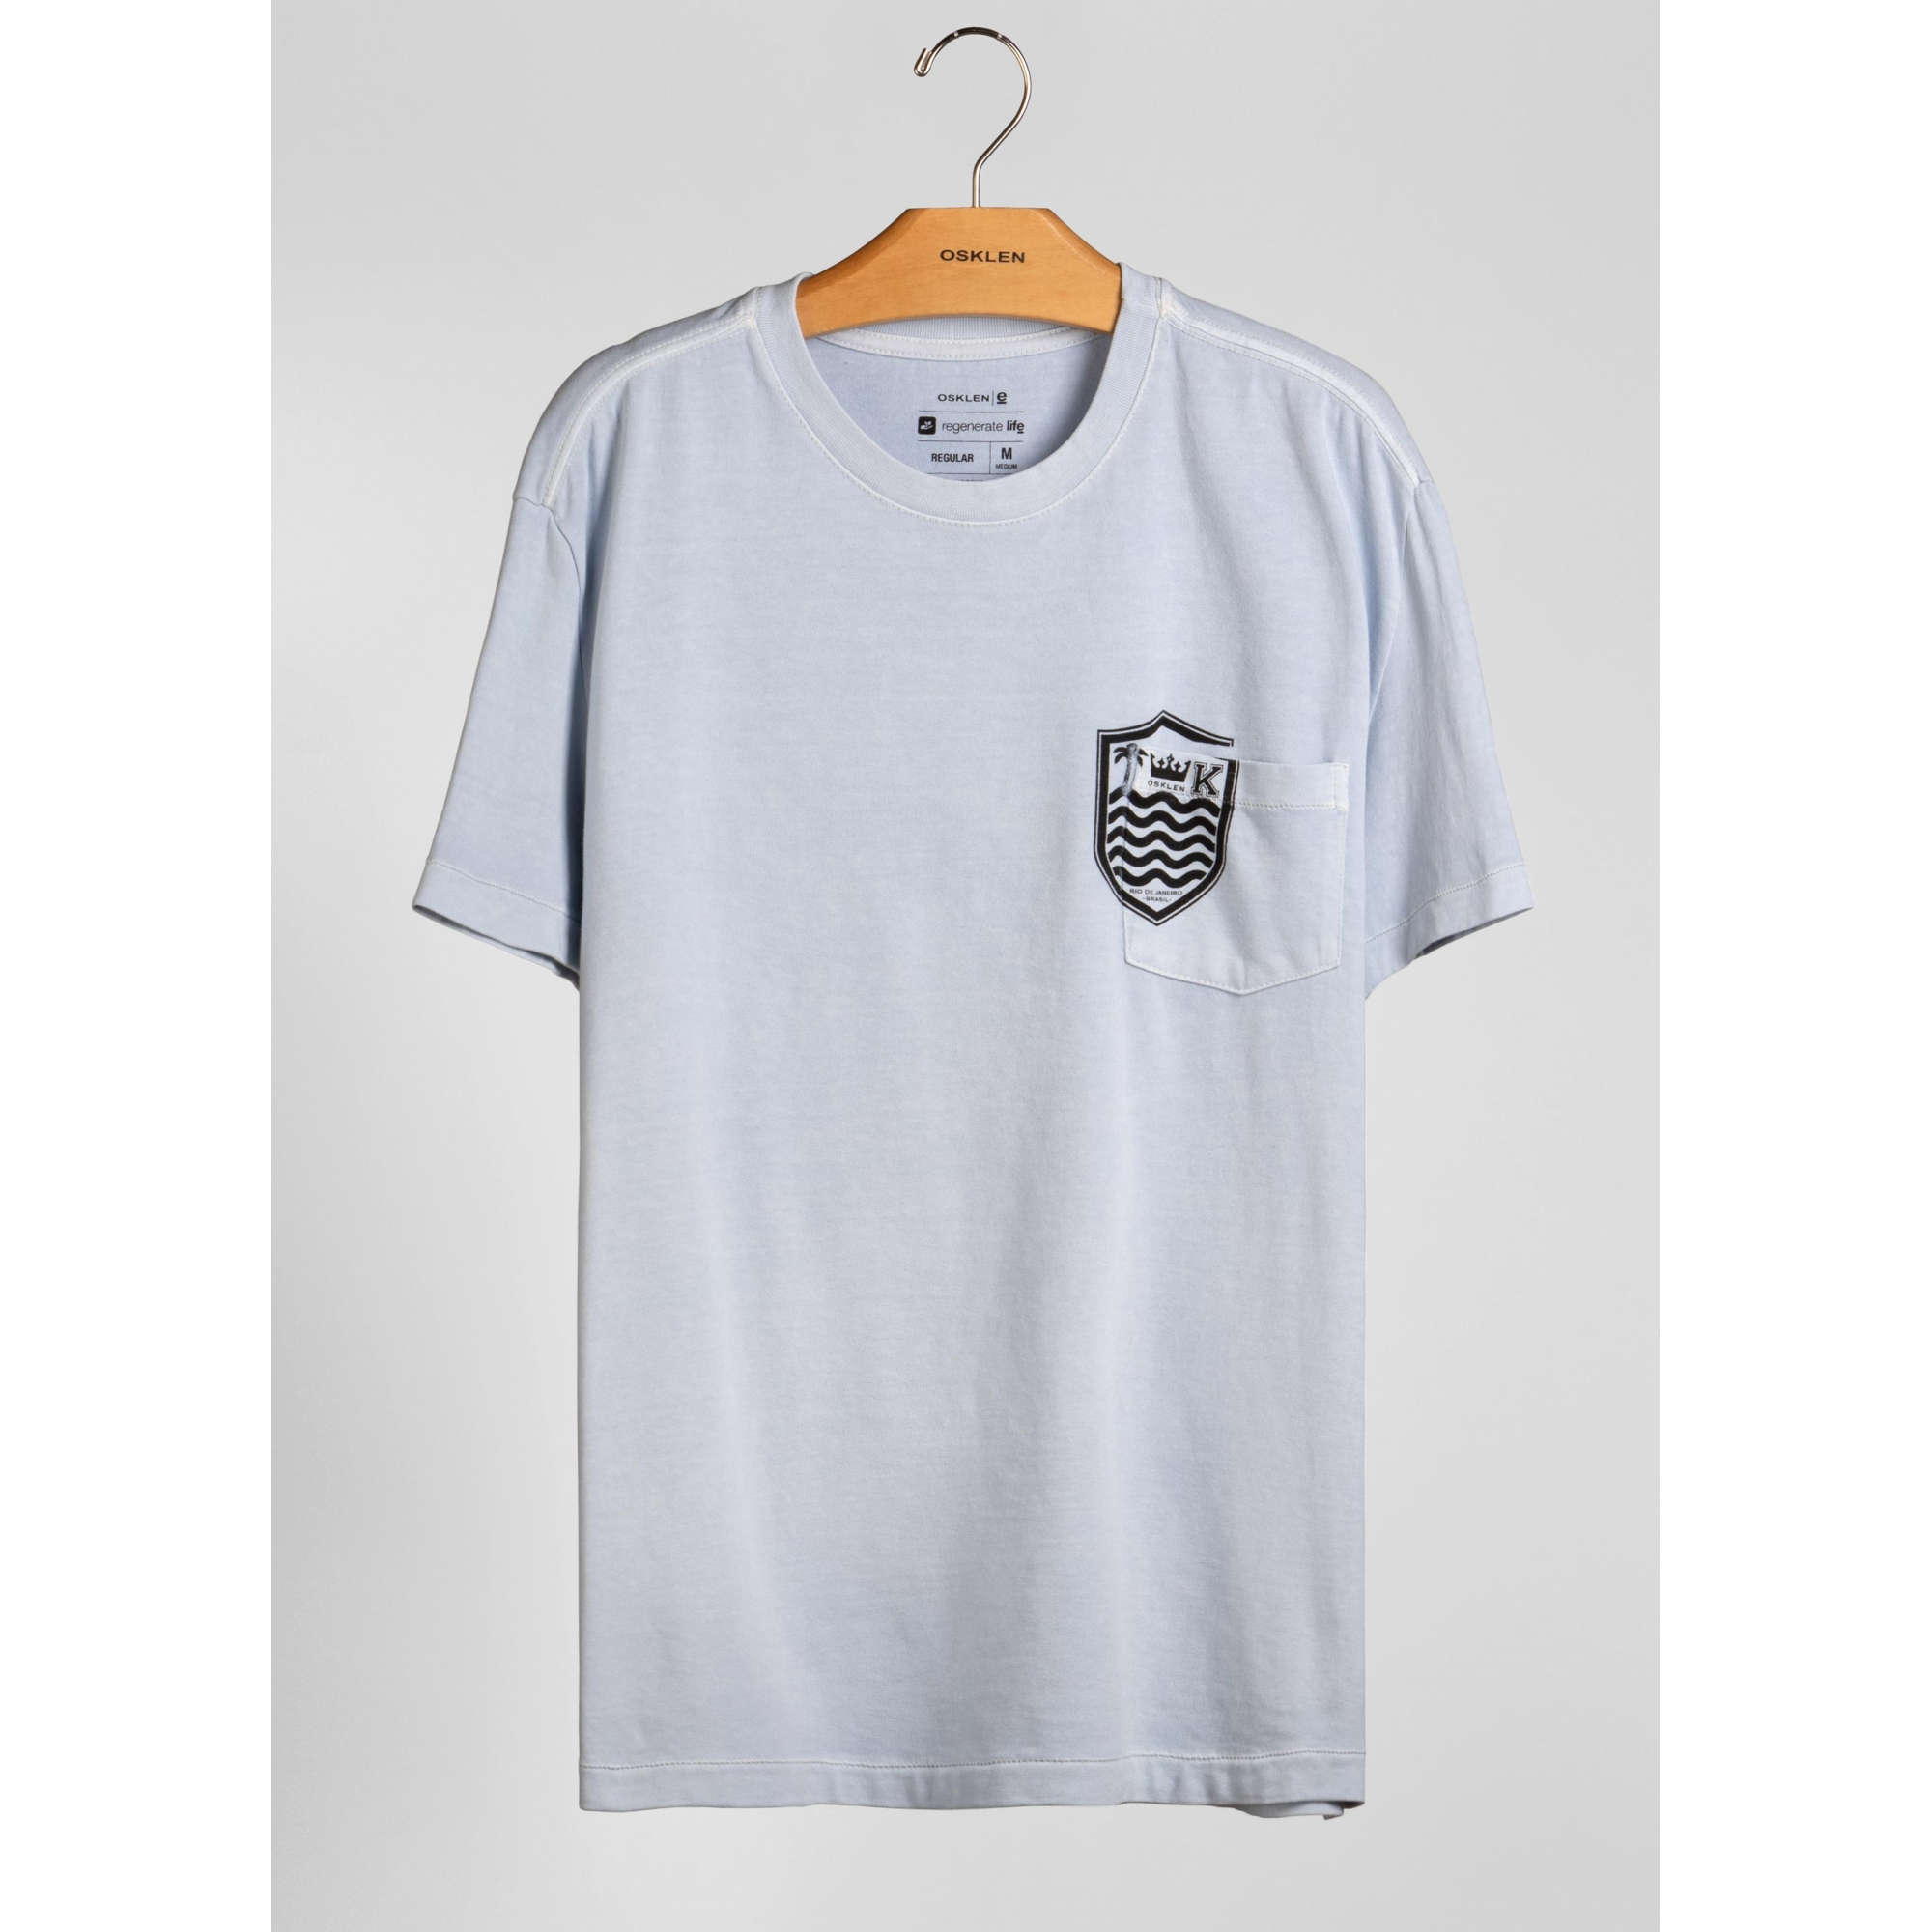 Osklen Camiseta Brasão Manga Curta Masculino Azul Claro